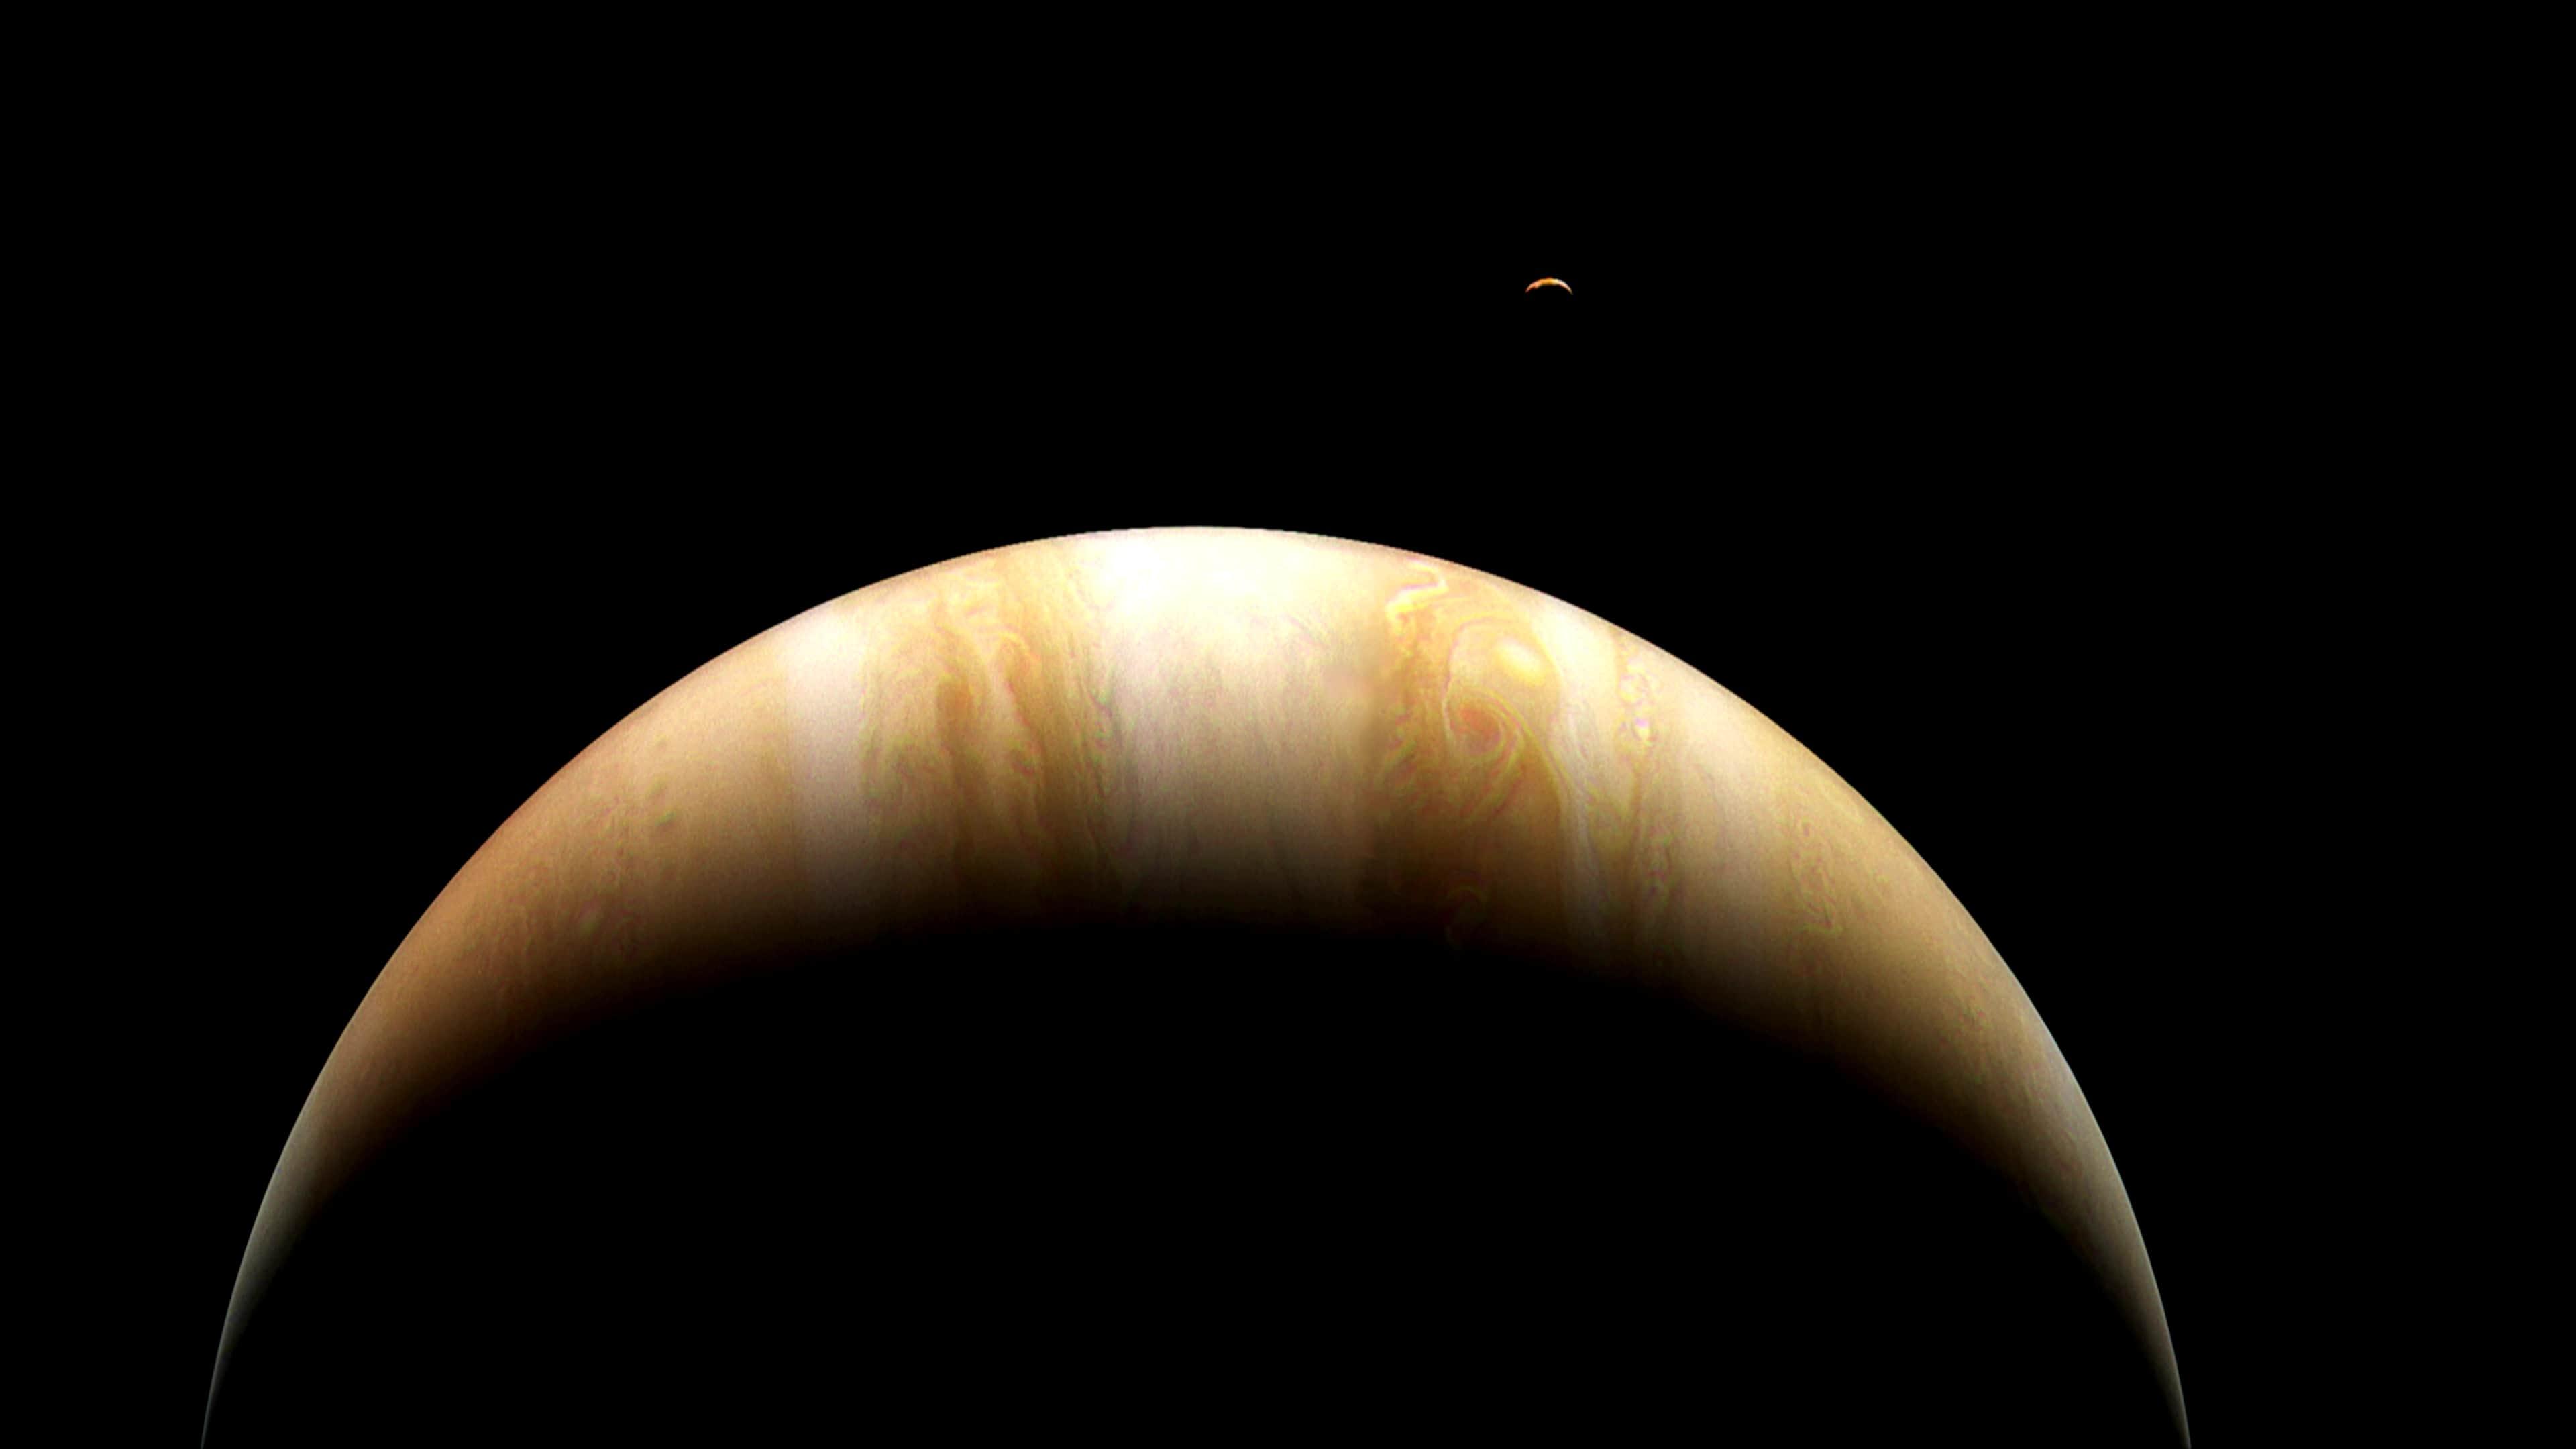 'Destination: Jupiter' Follows Journey of NASA's Juno Space Probe